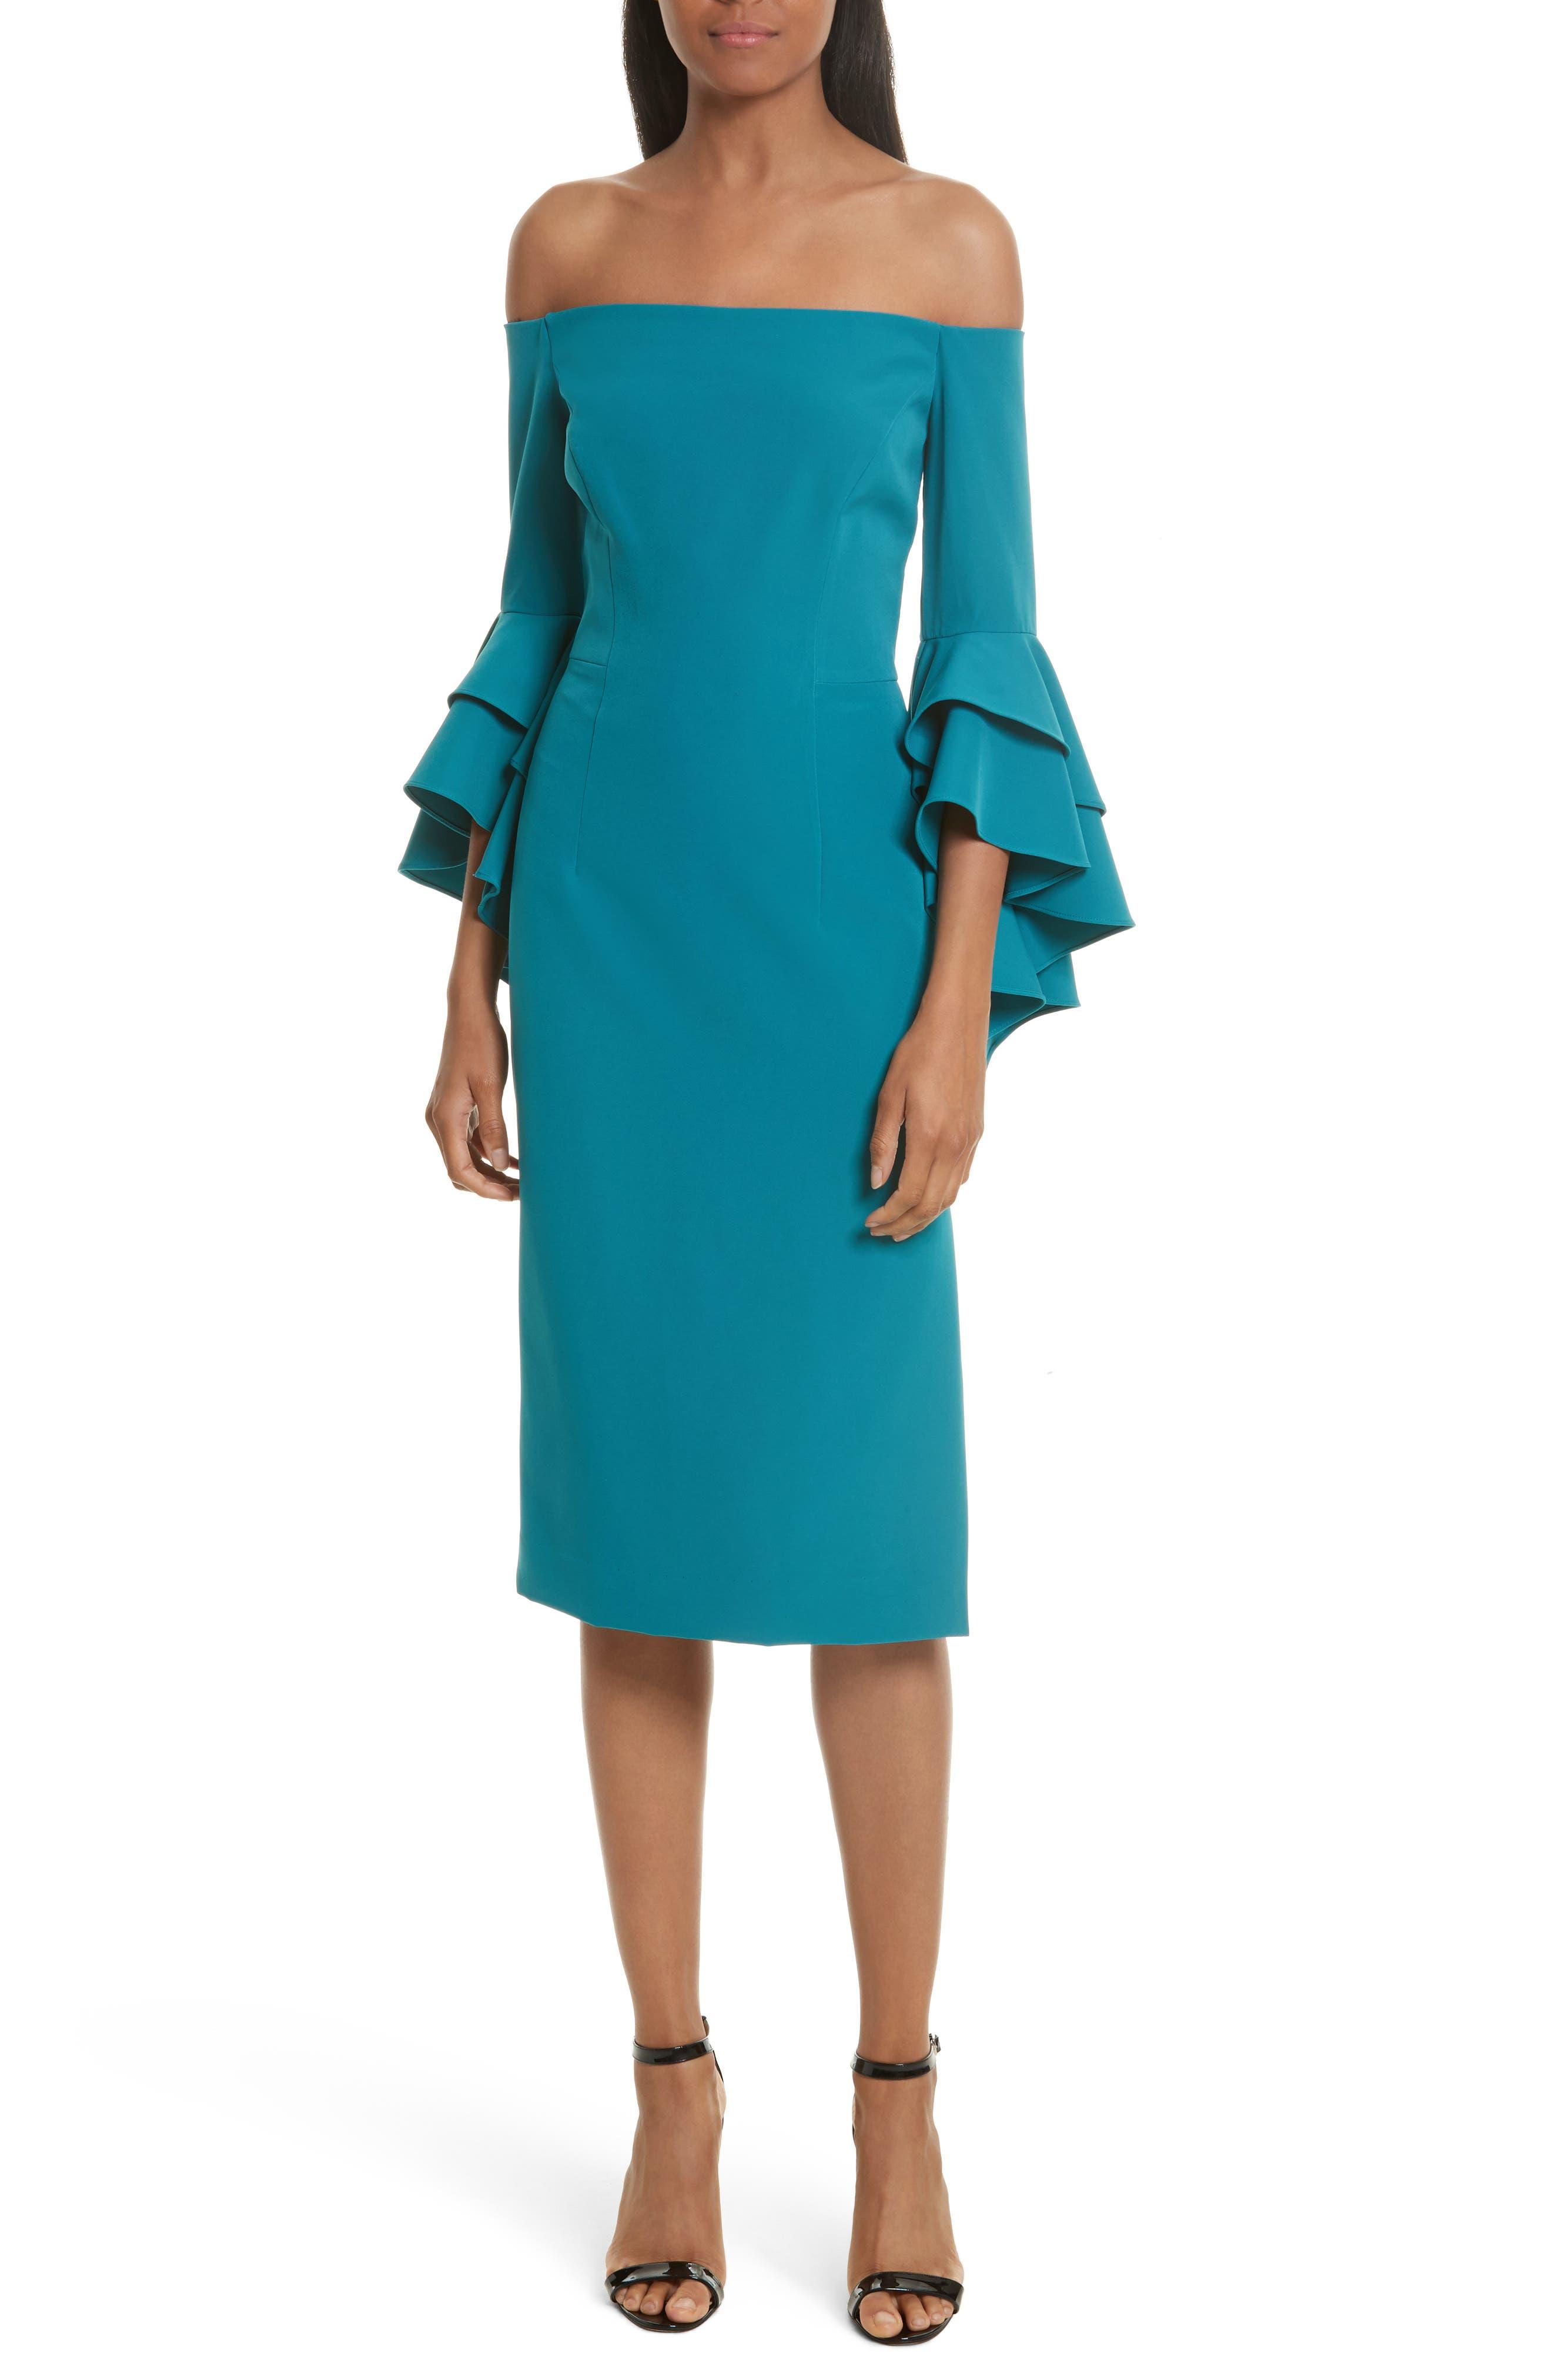 MILLY, Selena Off the Shoulder Midi Dress, Main thumbnail 1, color, 442